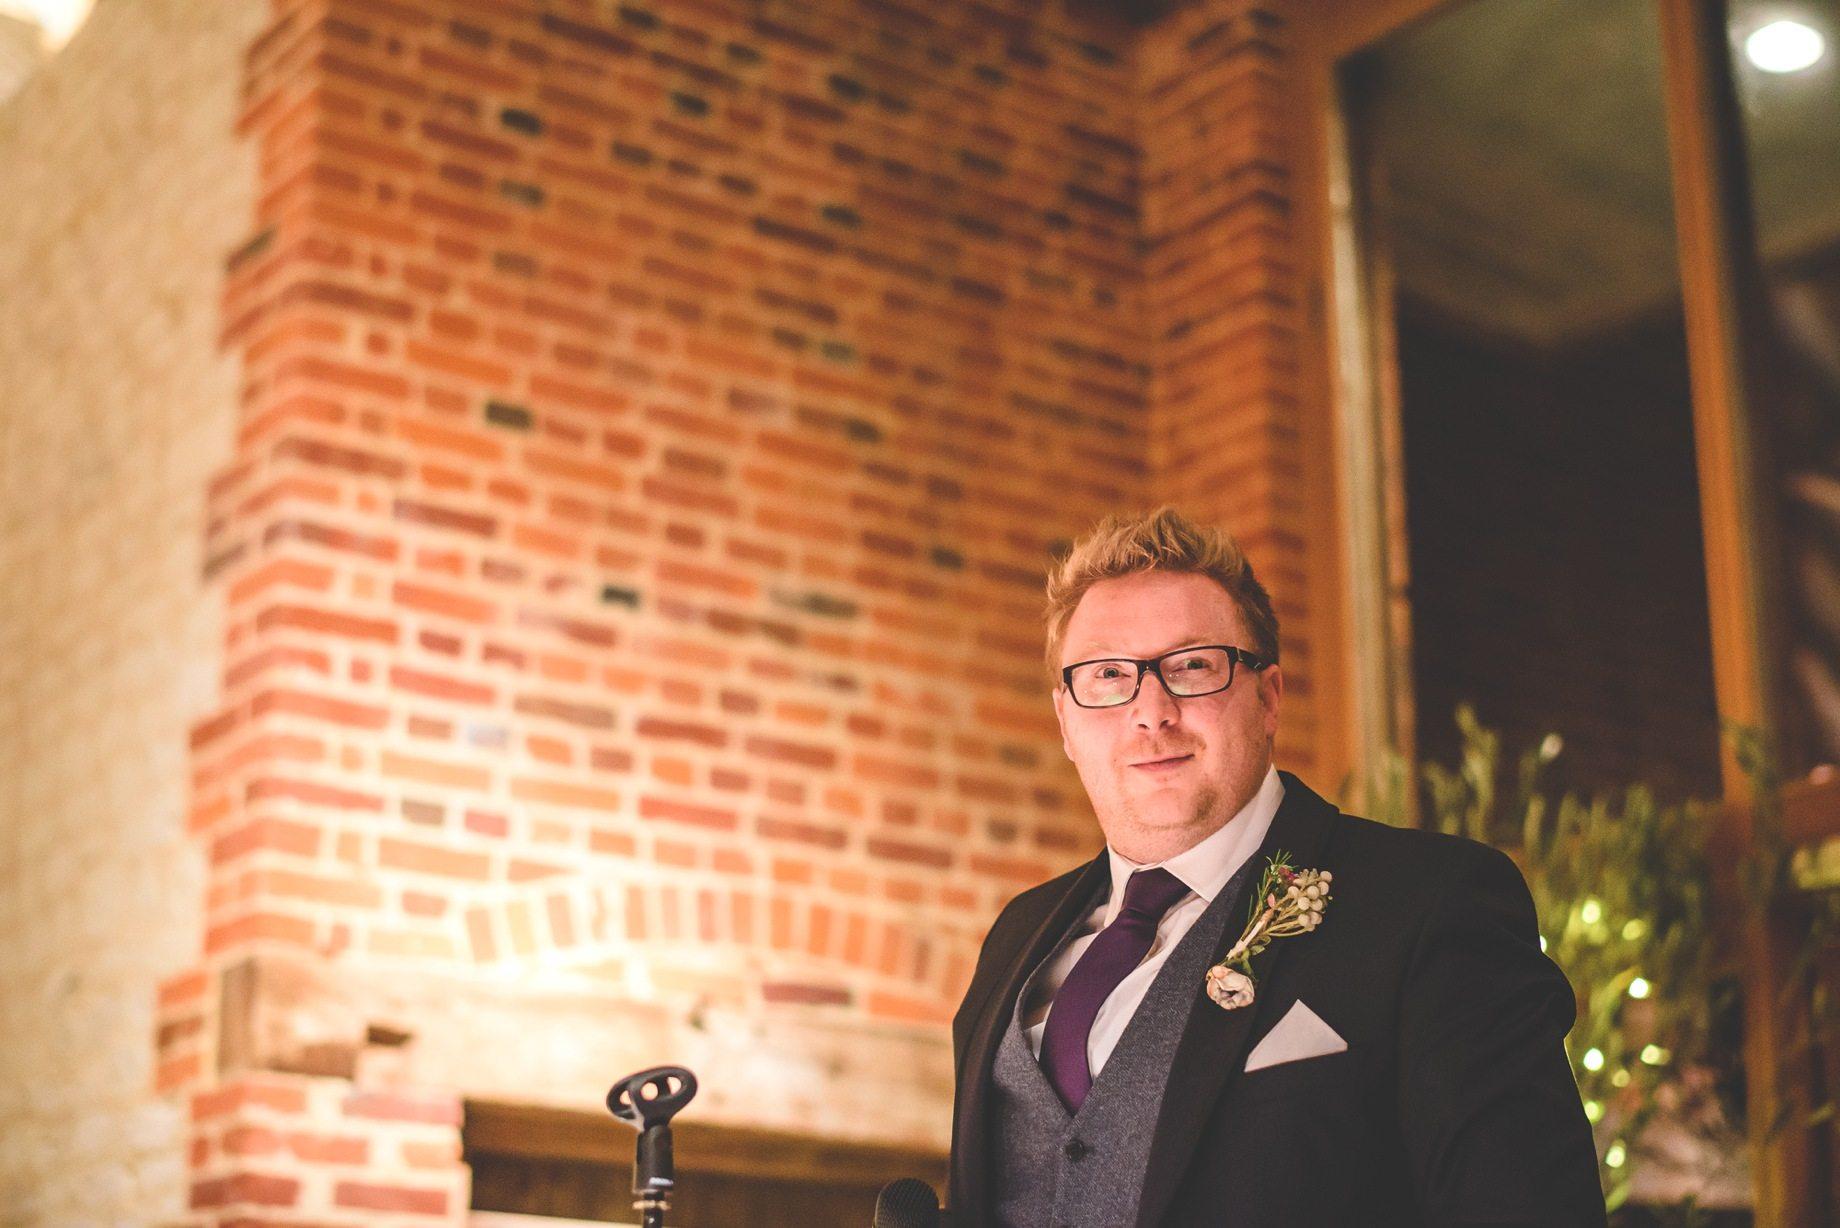 Heather and Chris - Hampshire wedding photography (147 of 174)